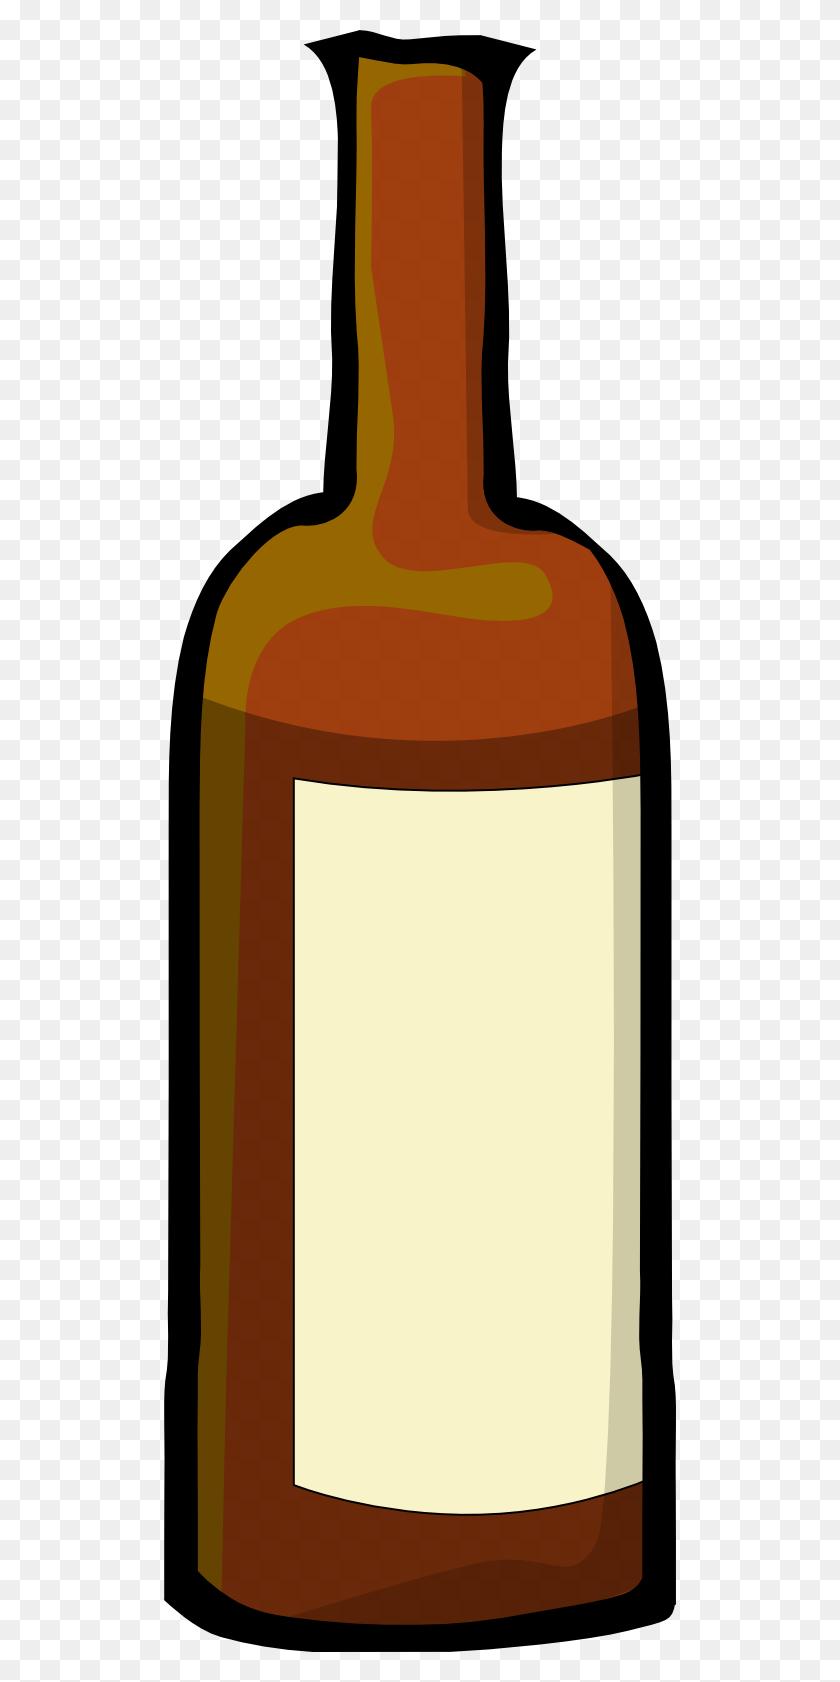 medium resolution of soda bottle clip art ketchup bottle clipart